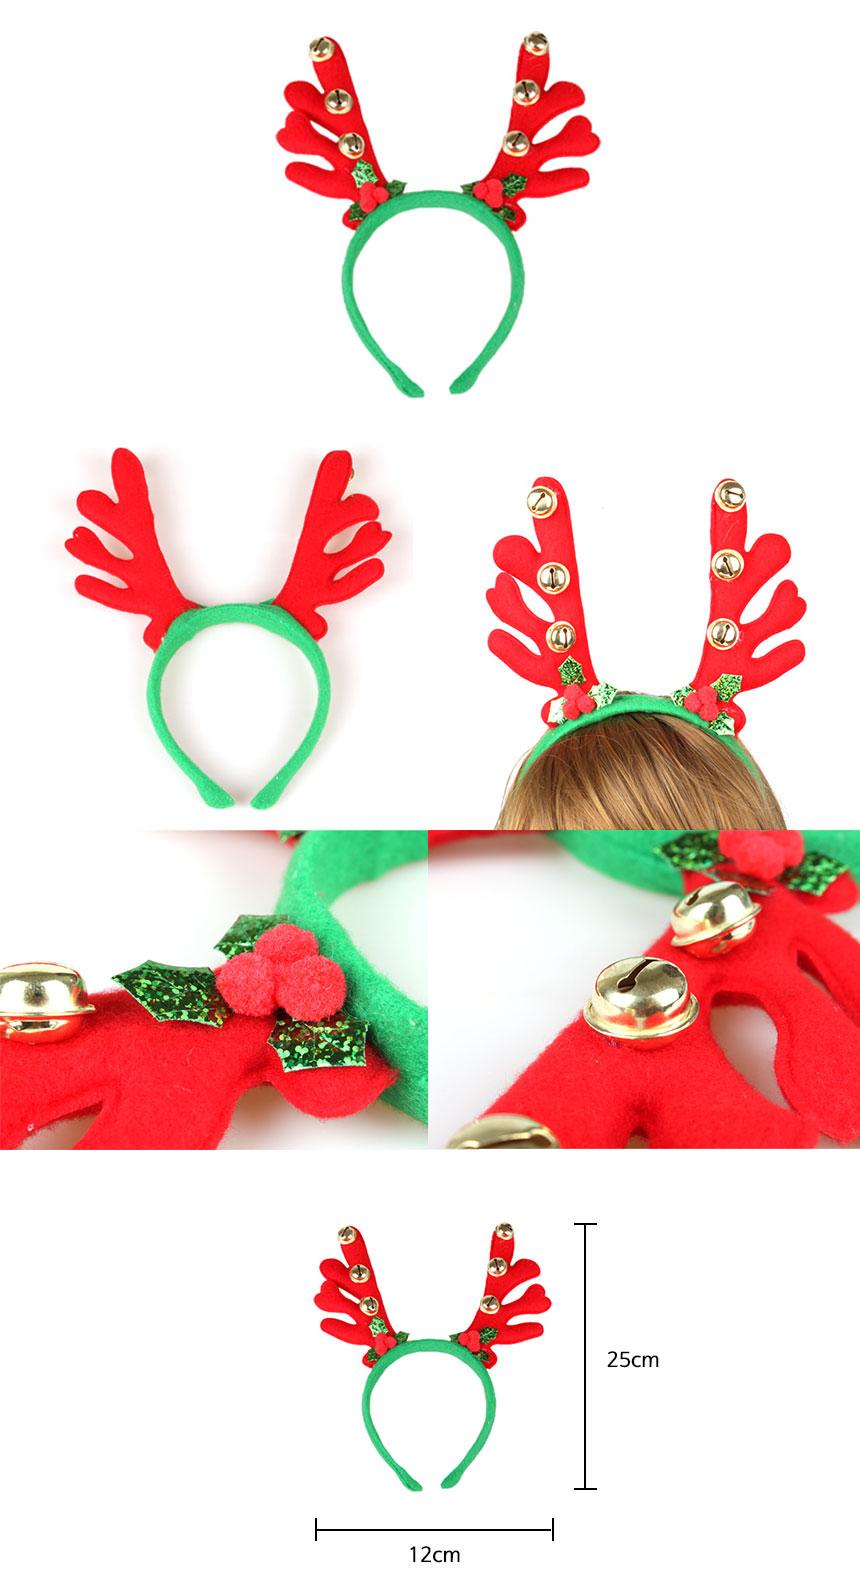 http://partyb2b.mireene.kr/img/party/Headband/Christmasbellheadband.jpg